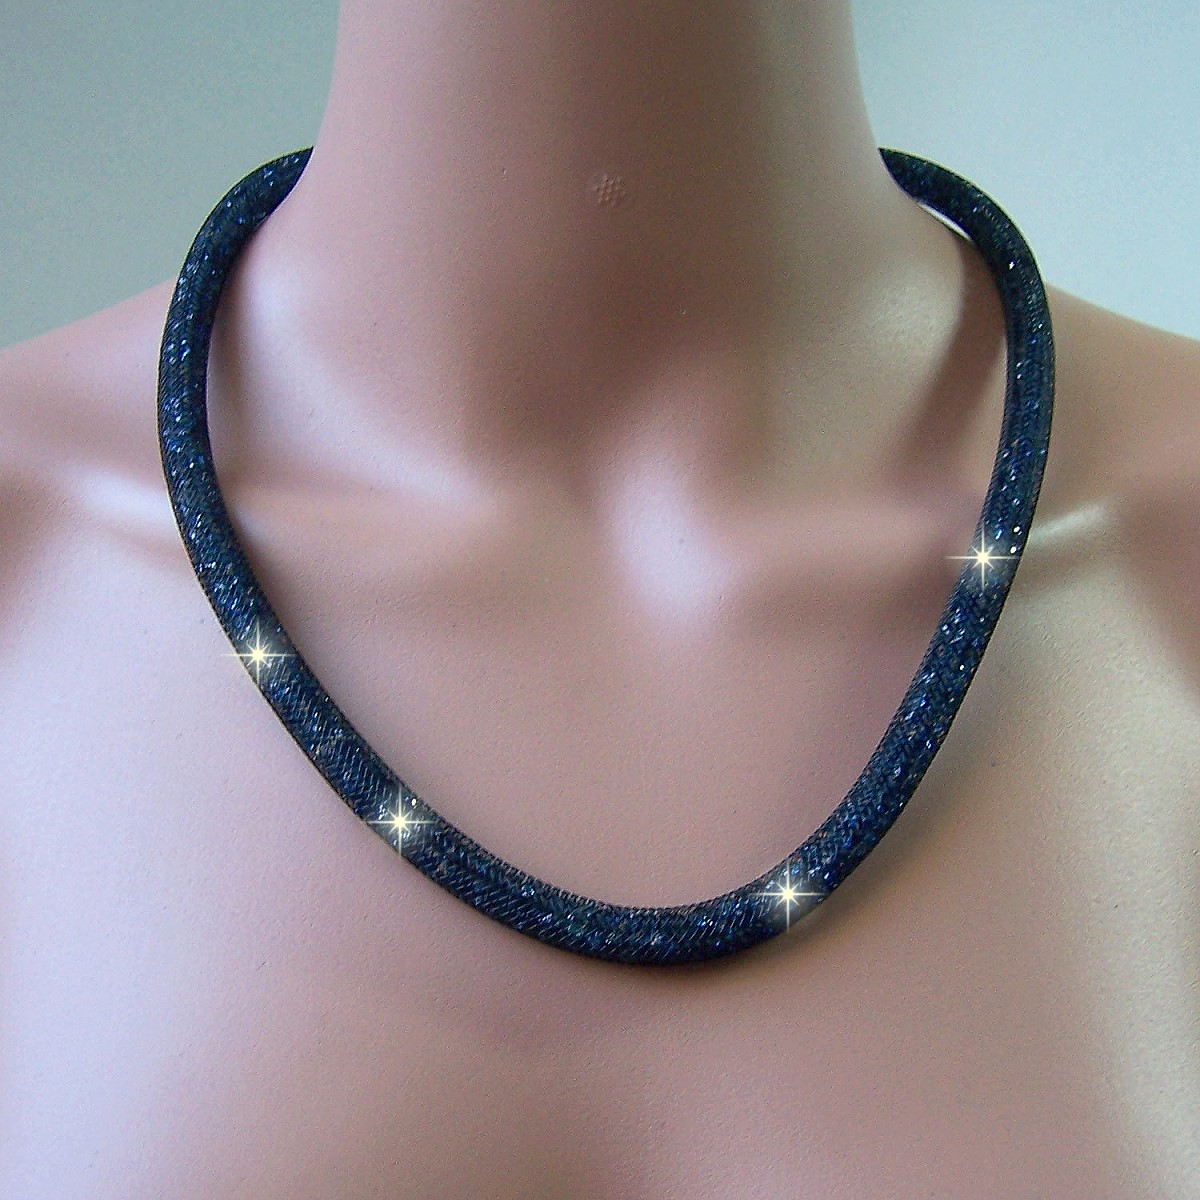 K1403# Collier 58cm lang Strasskristalle dunkelblau in 3D-Netzschlauch